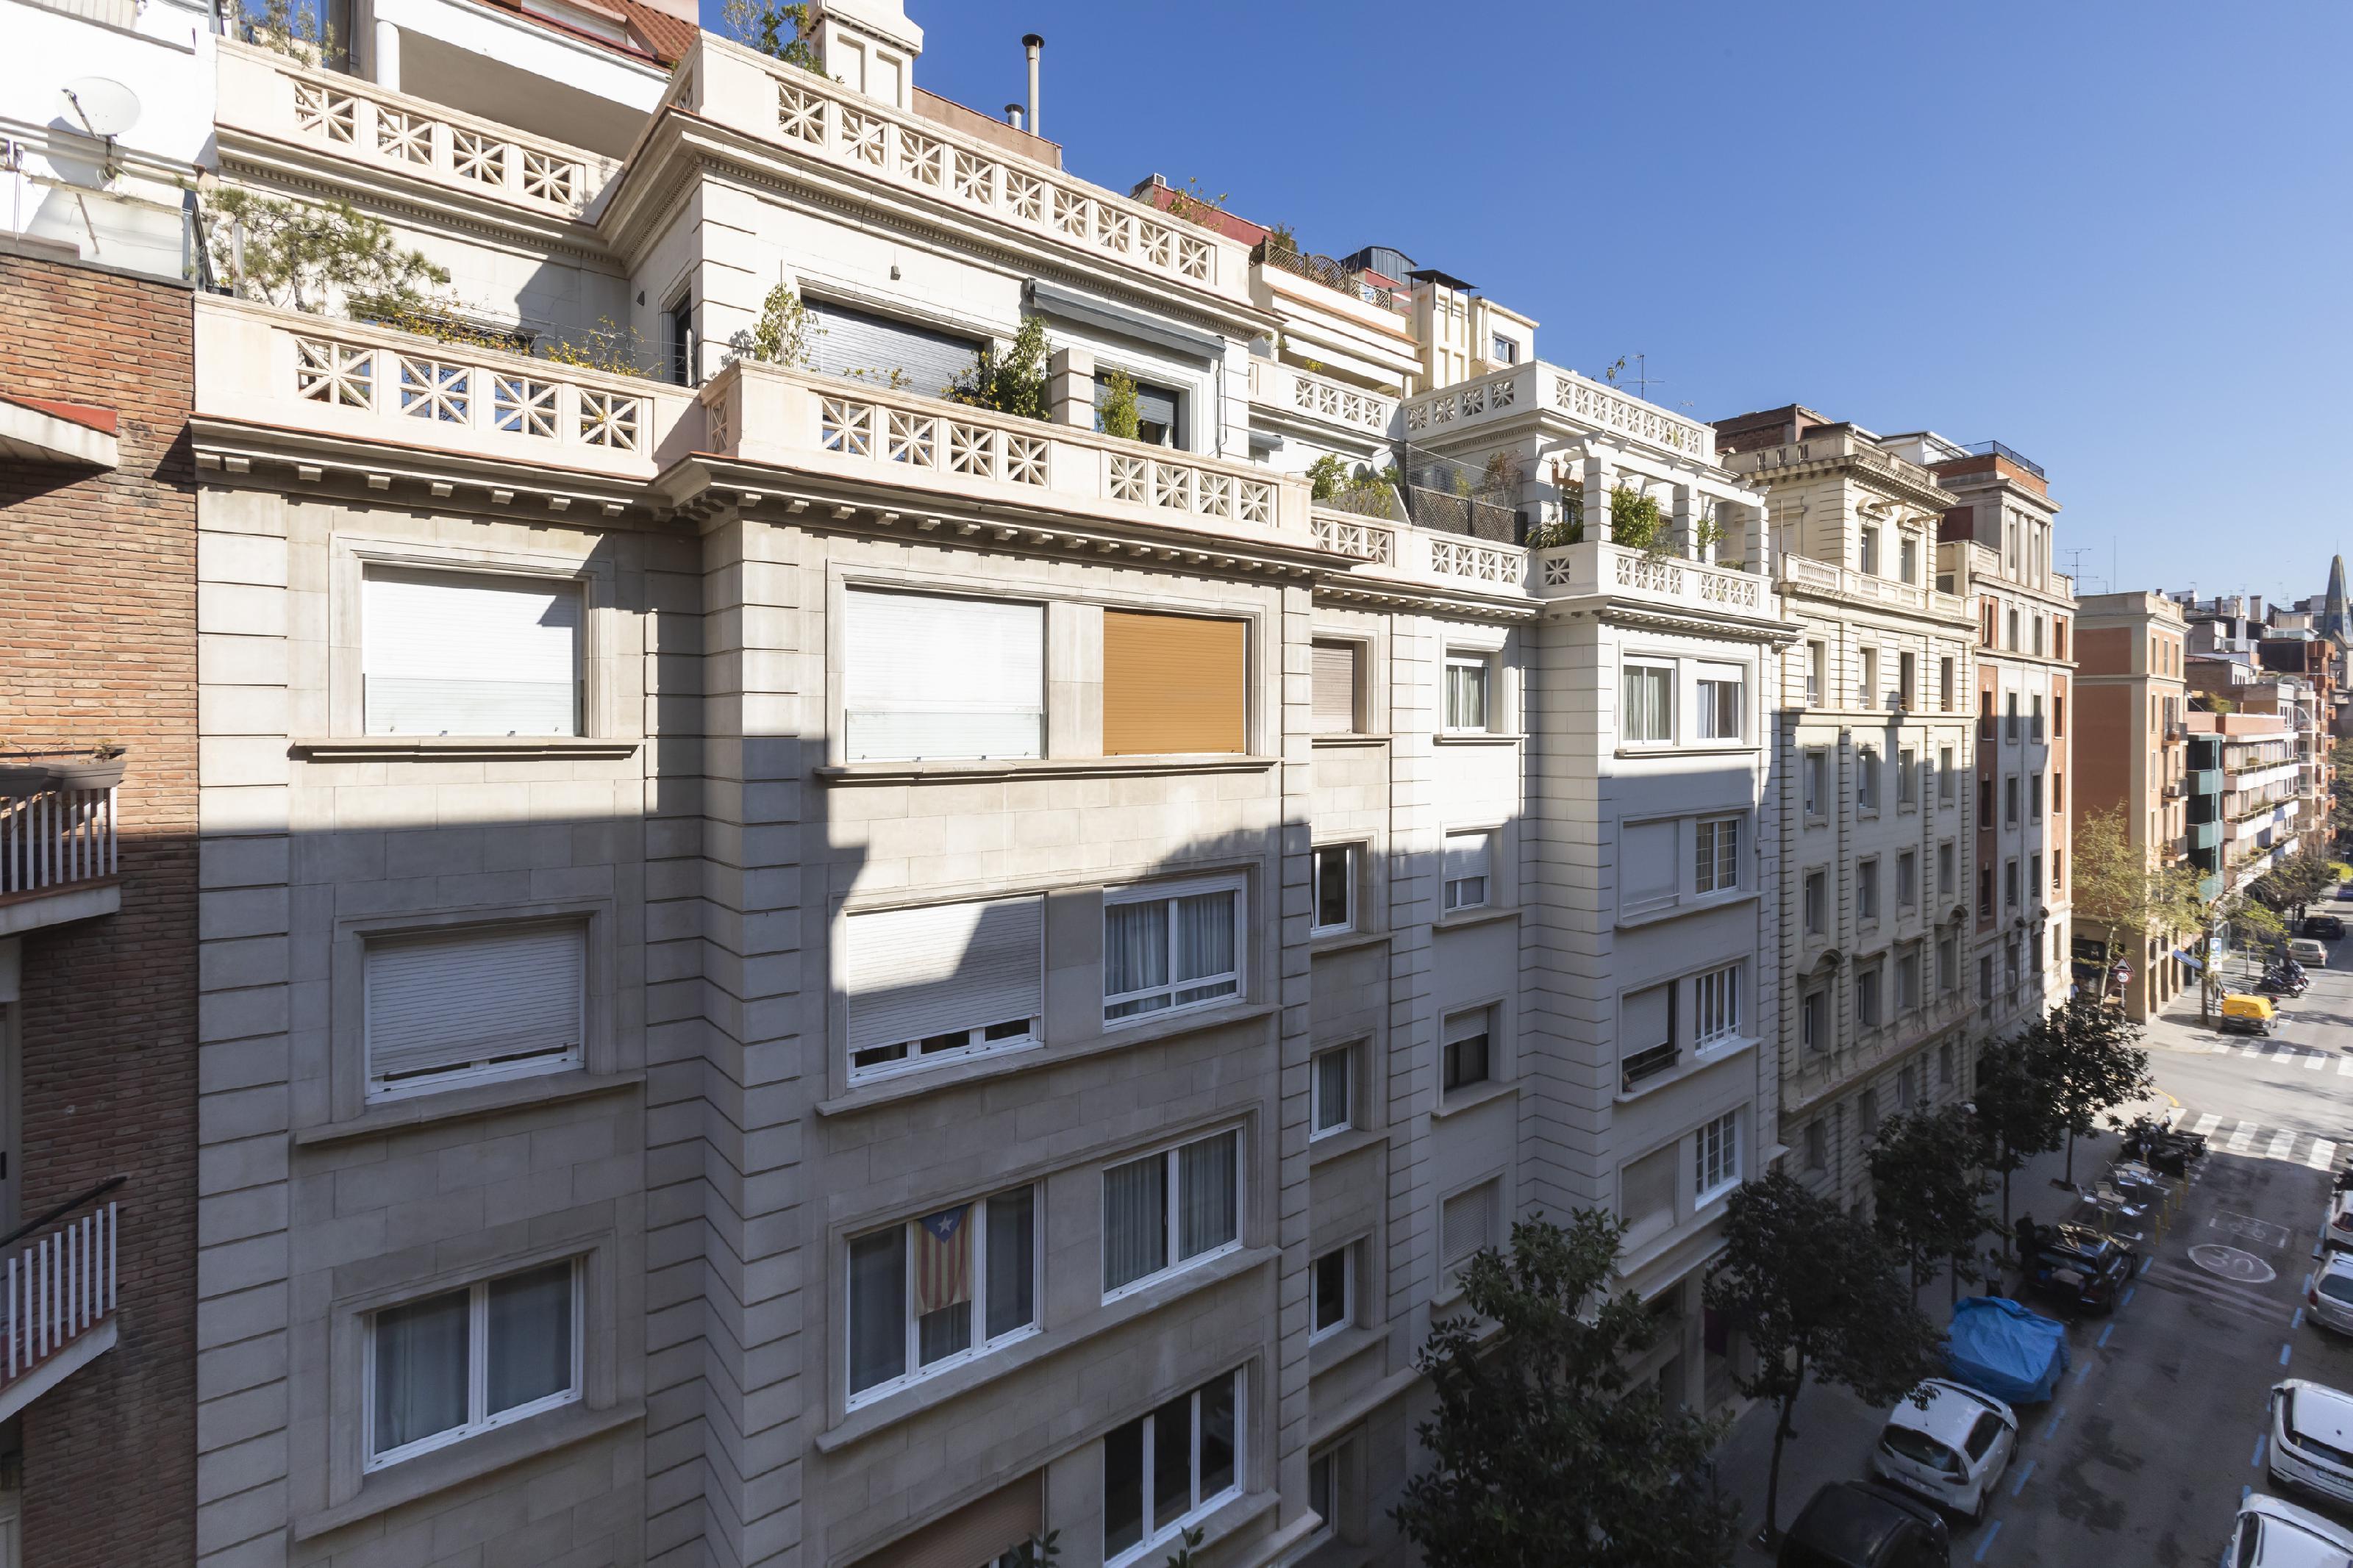 247097 Flat for sale in Sarrià-Sant Gervasi, Sant Gervasi-Galvany 23